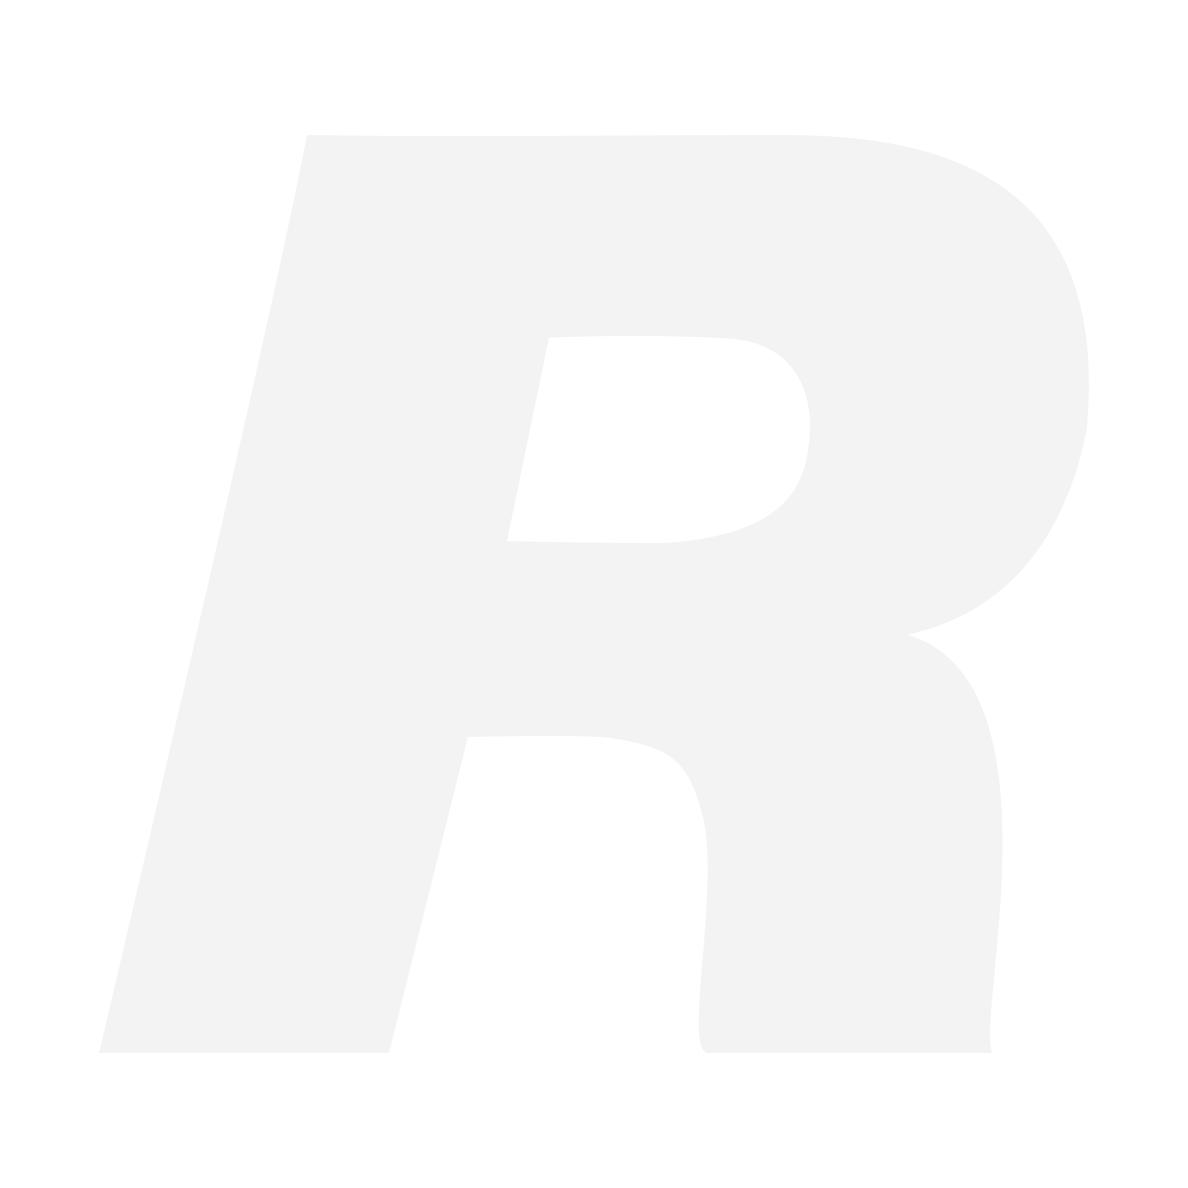 LASTOLITE L5621 Black/White Reversible 150cm x 180cm